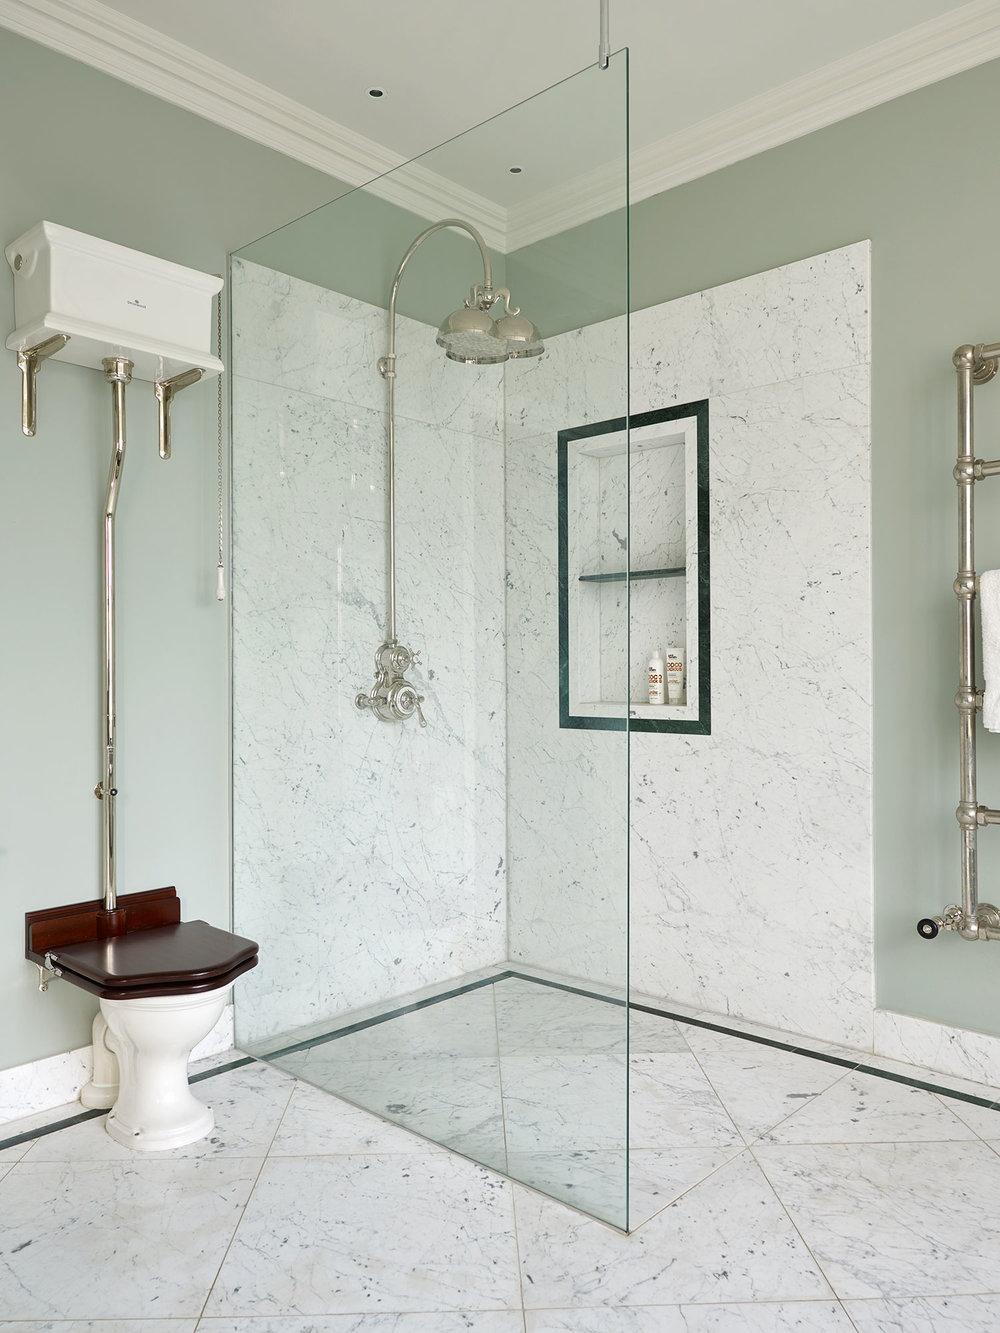 Dalby-Shower-Brora.jpg